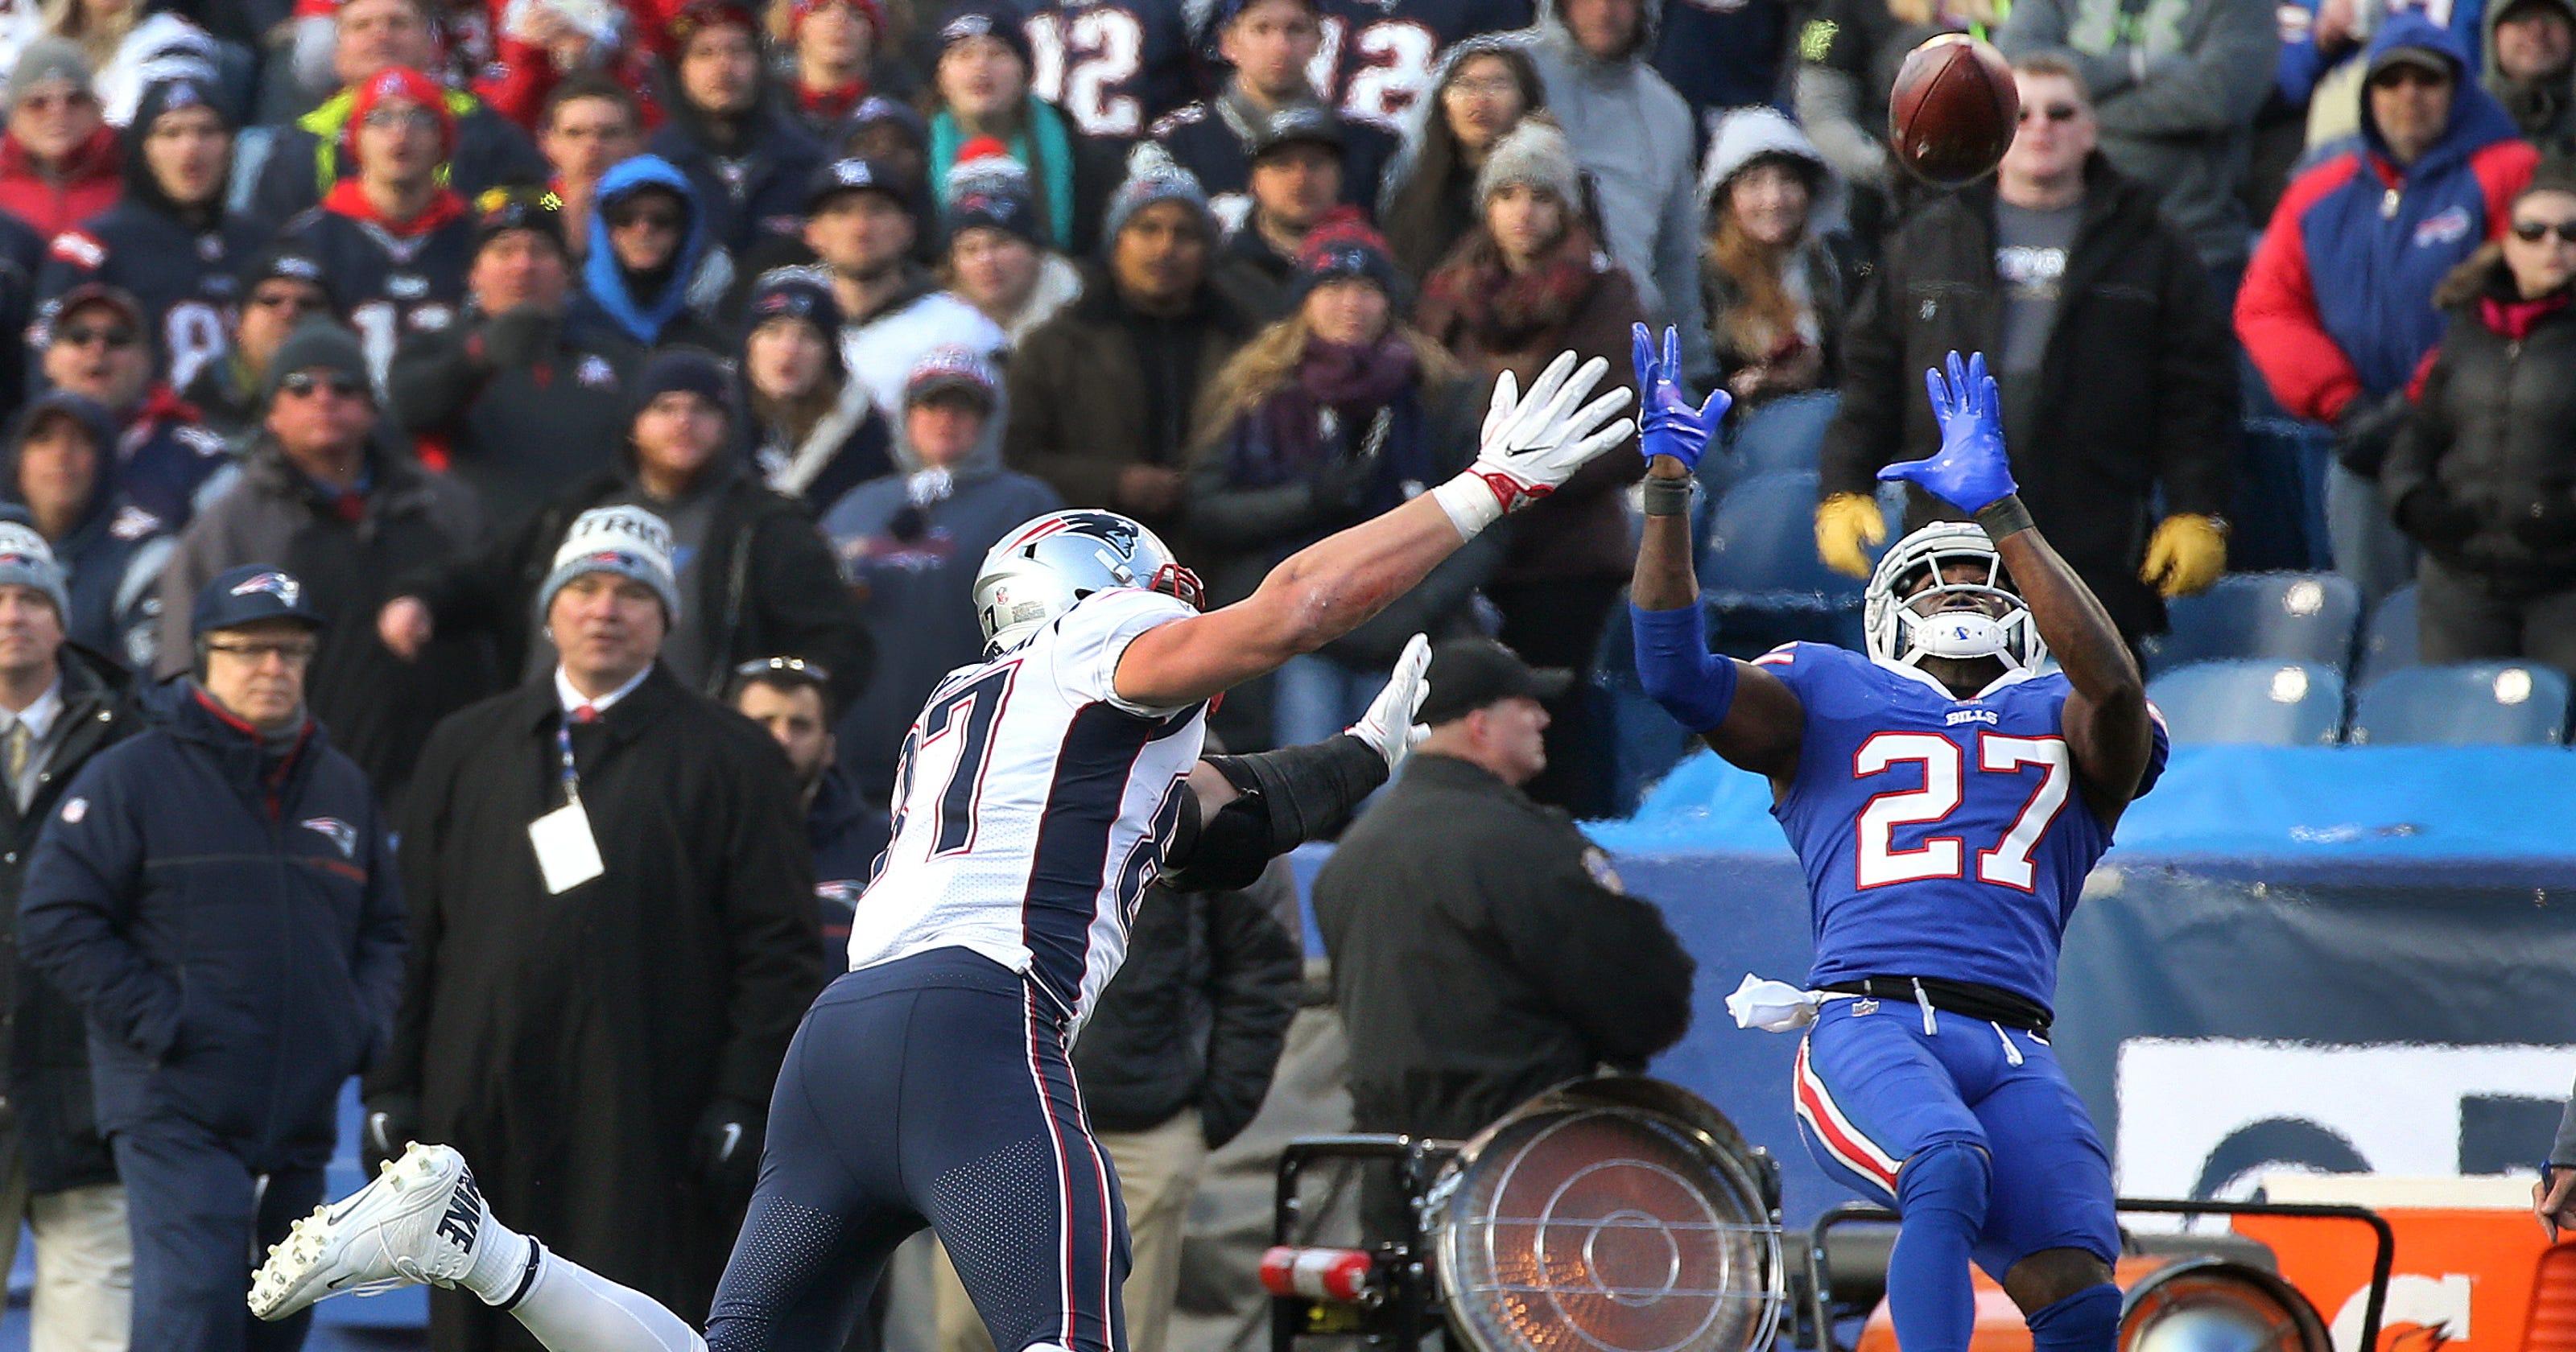 b3f1e44702d NFL suspends Patriots  Rob Gronkowski for hit on Tre Davious White